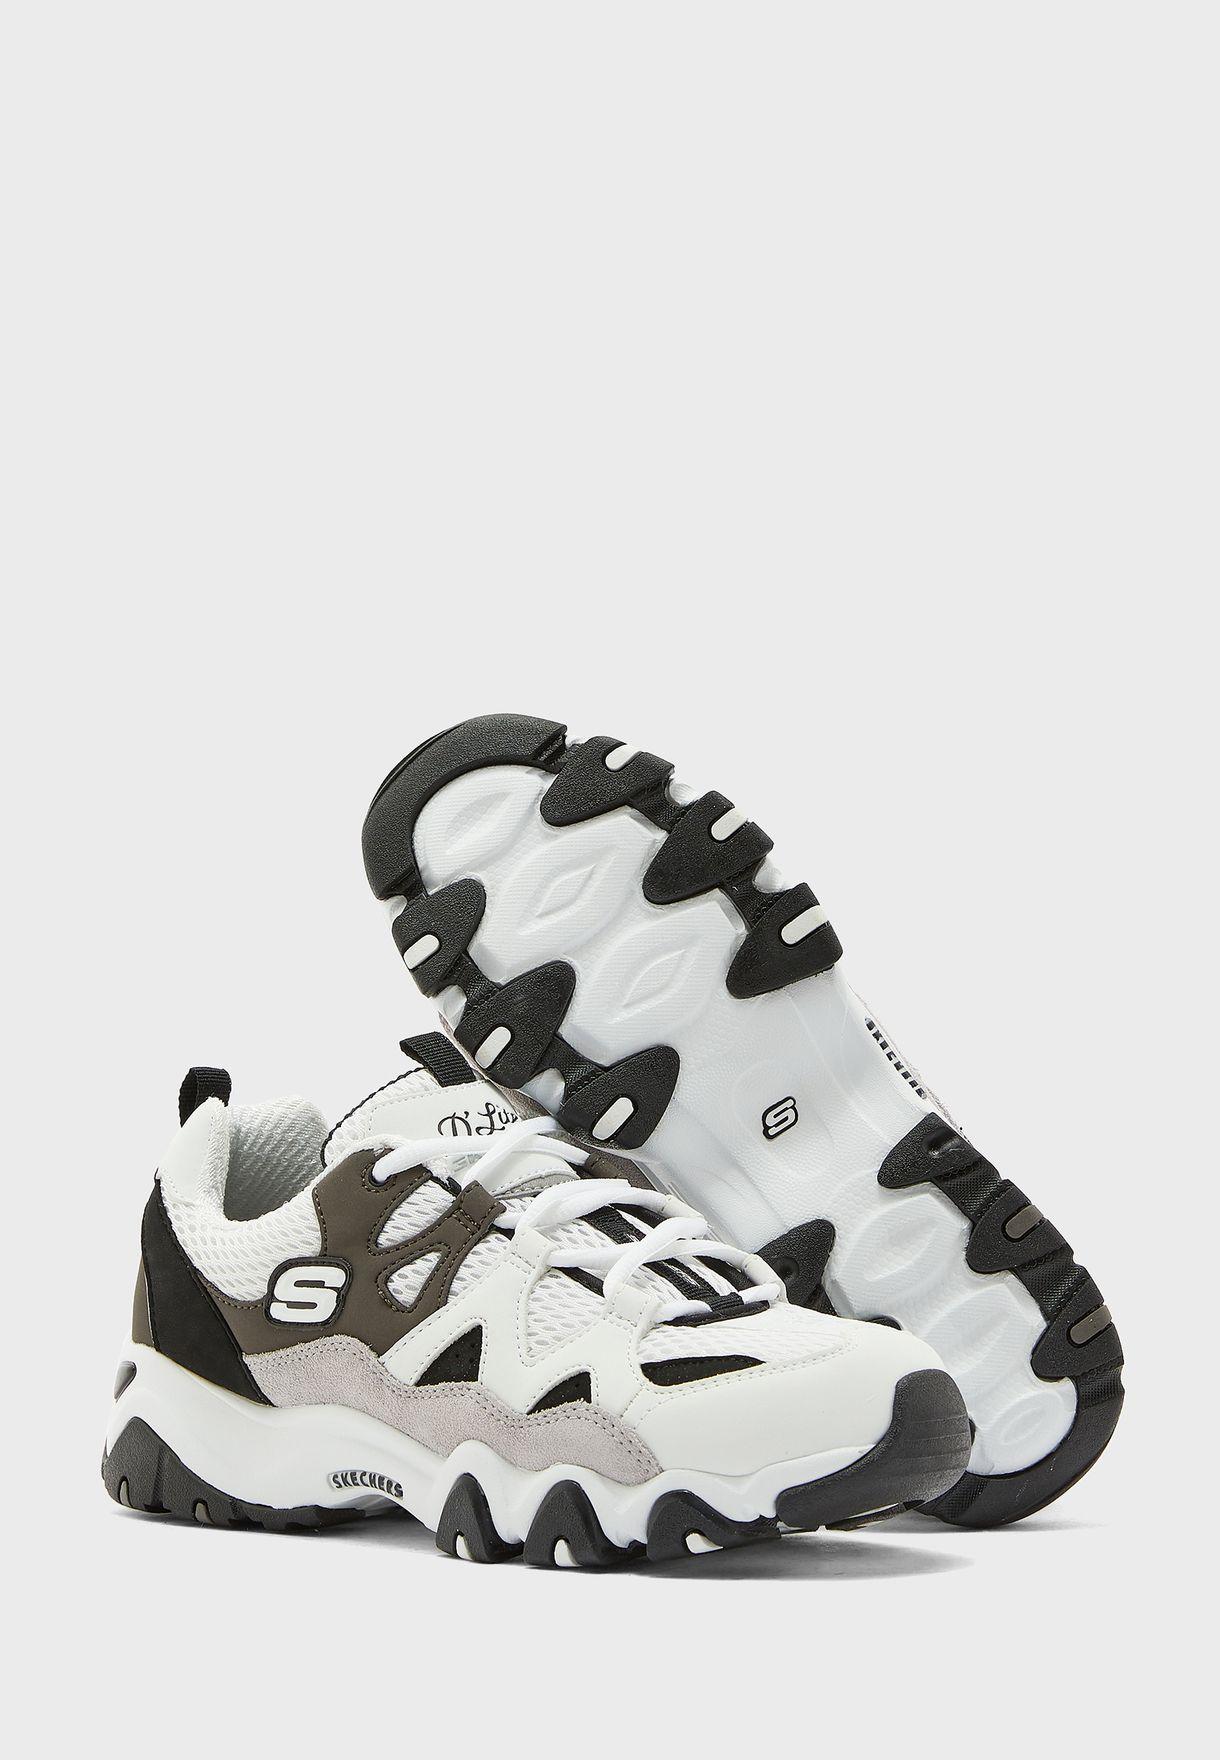 حذاء ديلايتس 2 توب داون